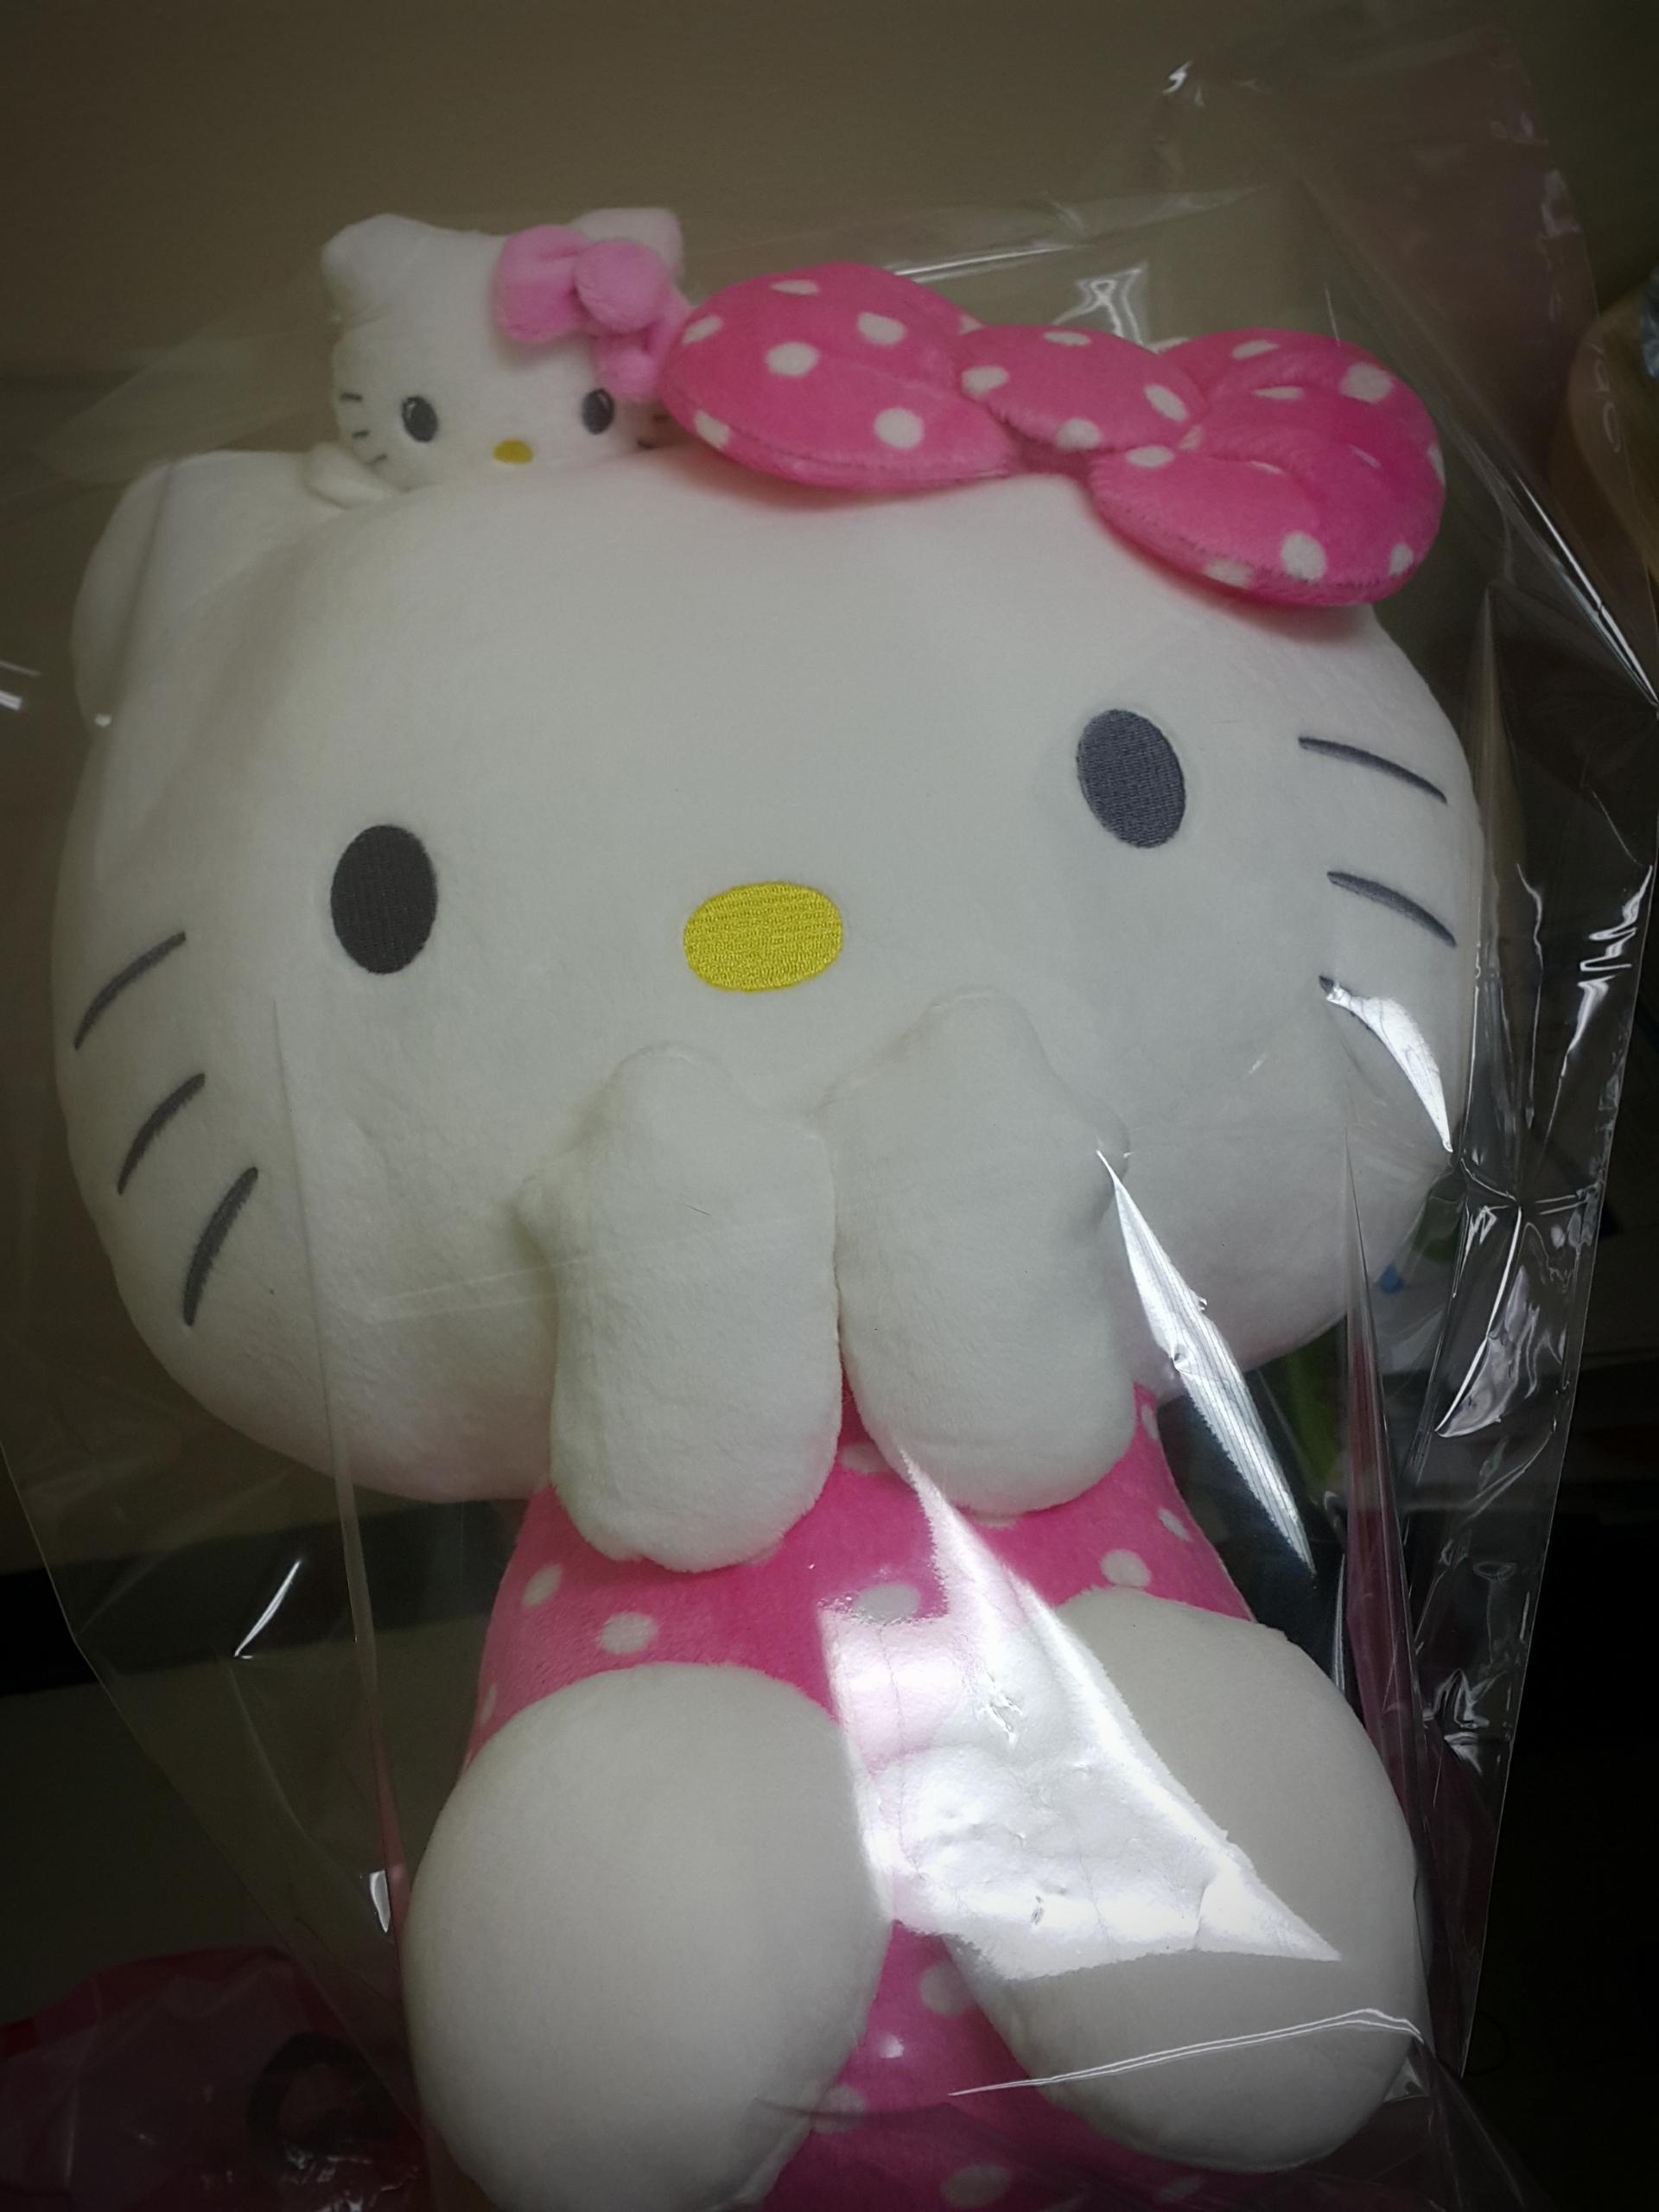 Hello Kitty with little twins plush doll SIZE L ตุ๊กตาเฮลโหลคิตตี้..มาพร้อมน้องตี้ตัวน้อยน่ารักเกาะหัว 50 ซม. Hello Kitty with little twins plush doll SIZE L ตุ๊กตาเฮลโหลคิตตี้..มาพร้อมน้องตี้ตัวน้อยน่ารักเกาะหัว 50 ซม.